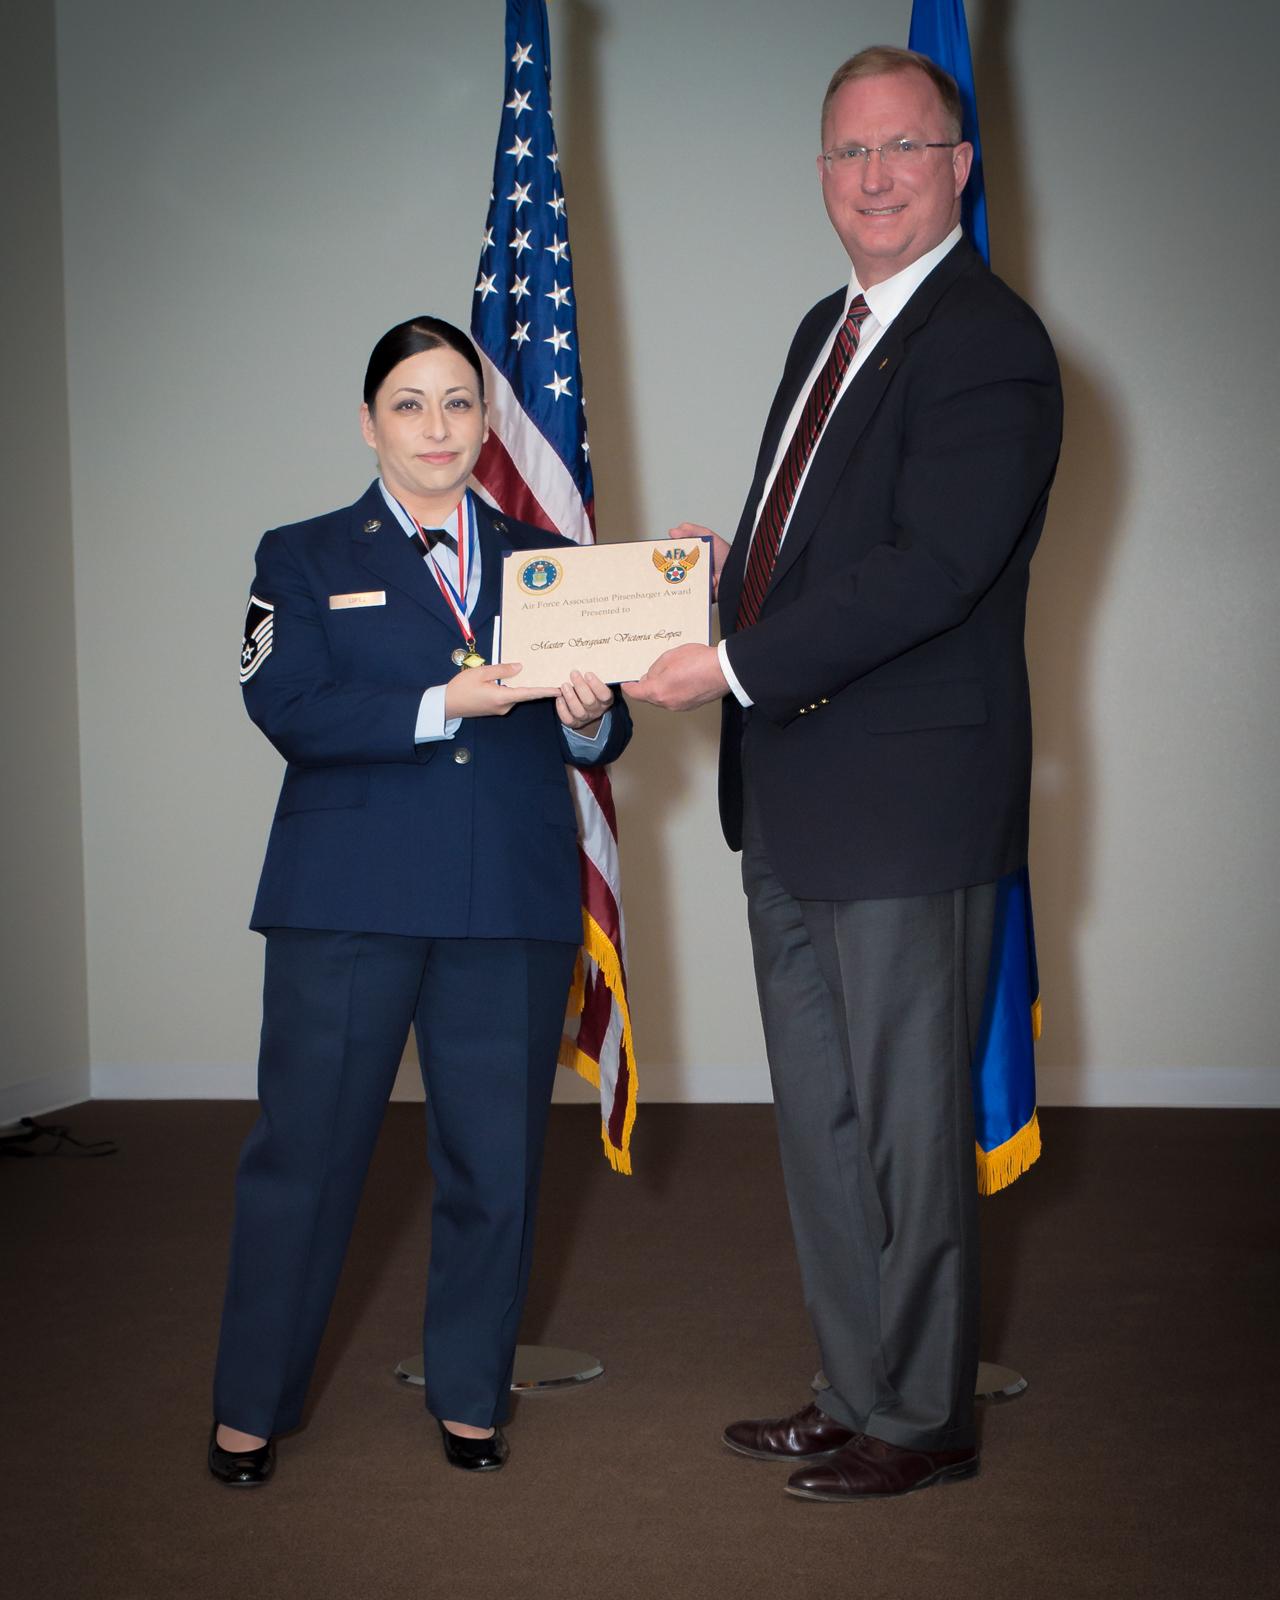 wyoming air national guard airmen recognized for educational and wyoming air national guard airmen recognized for educational and professional achievement